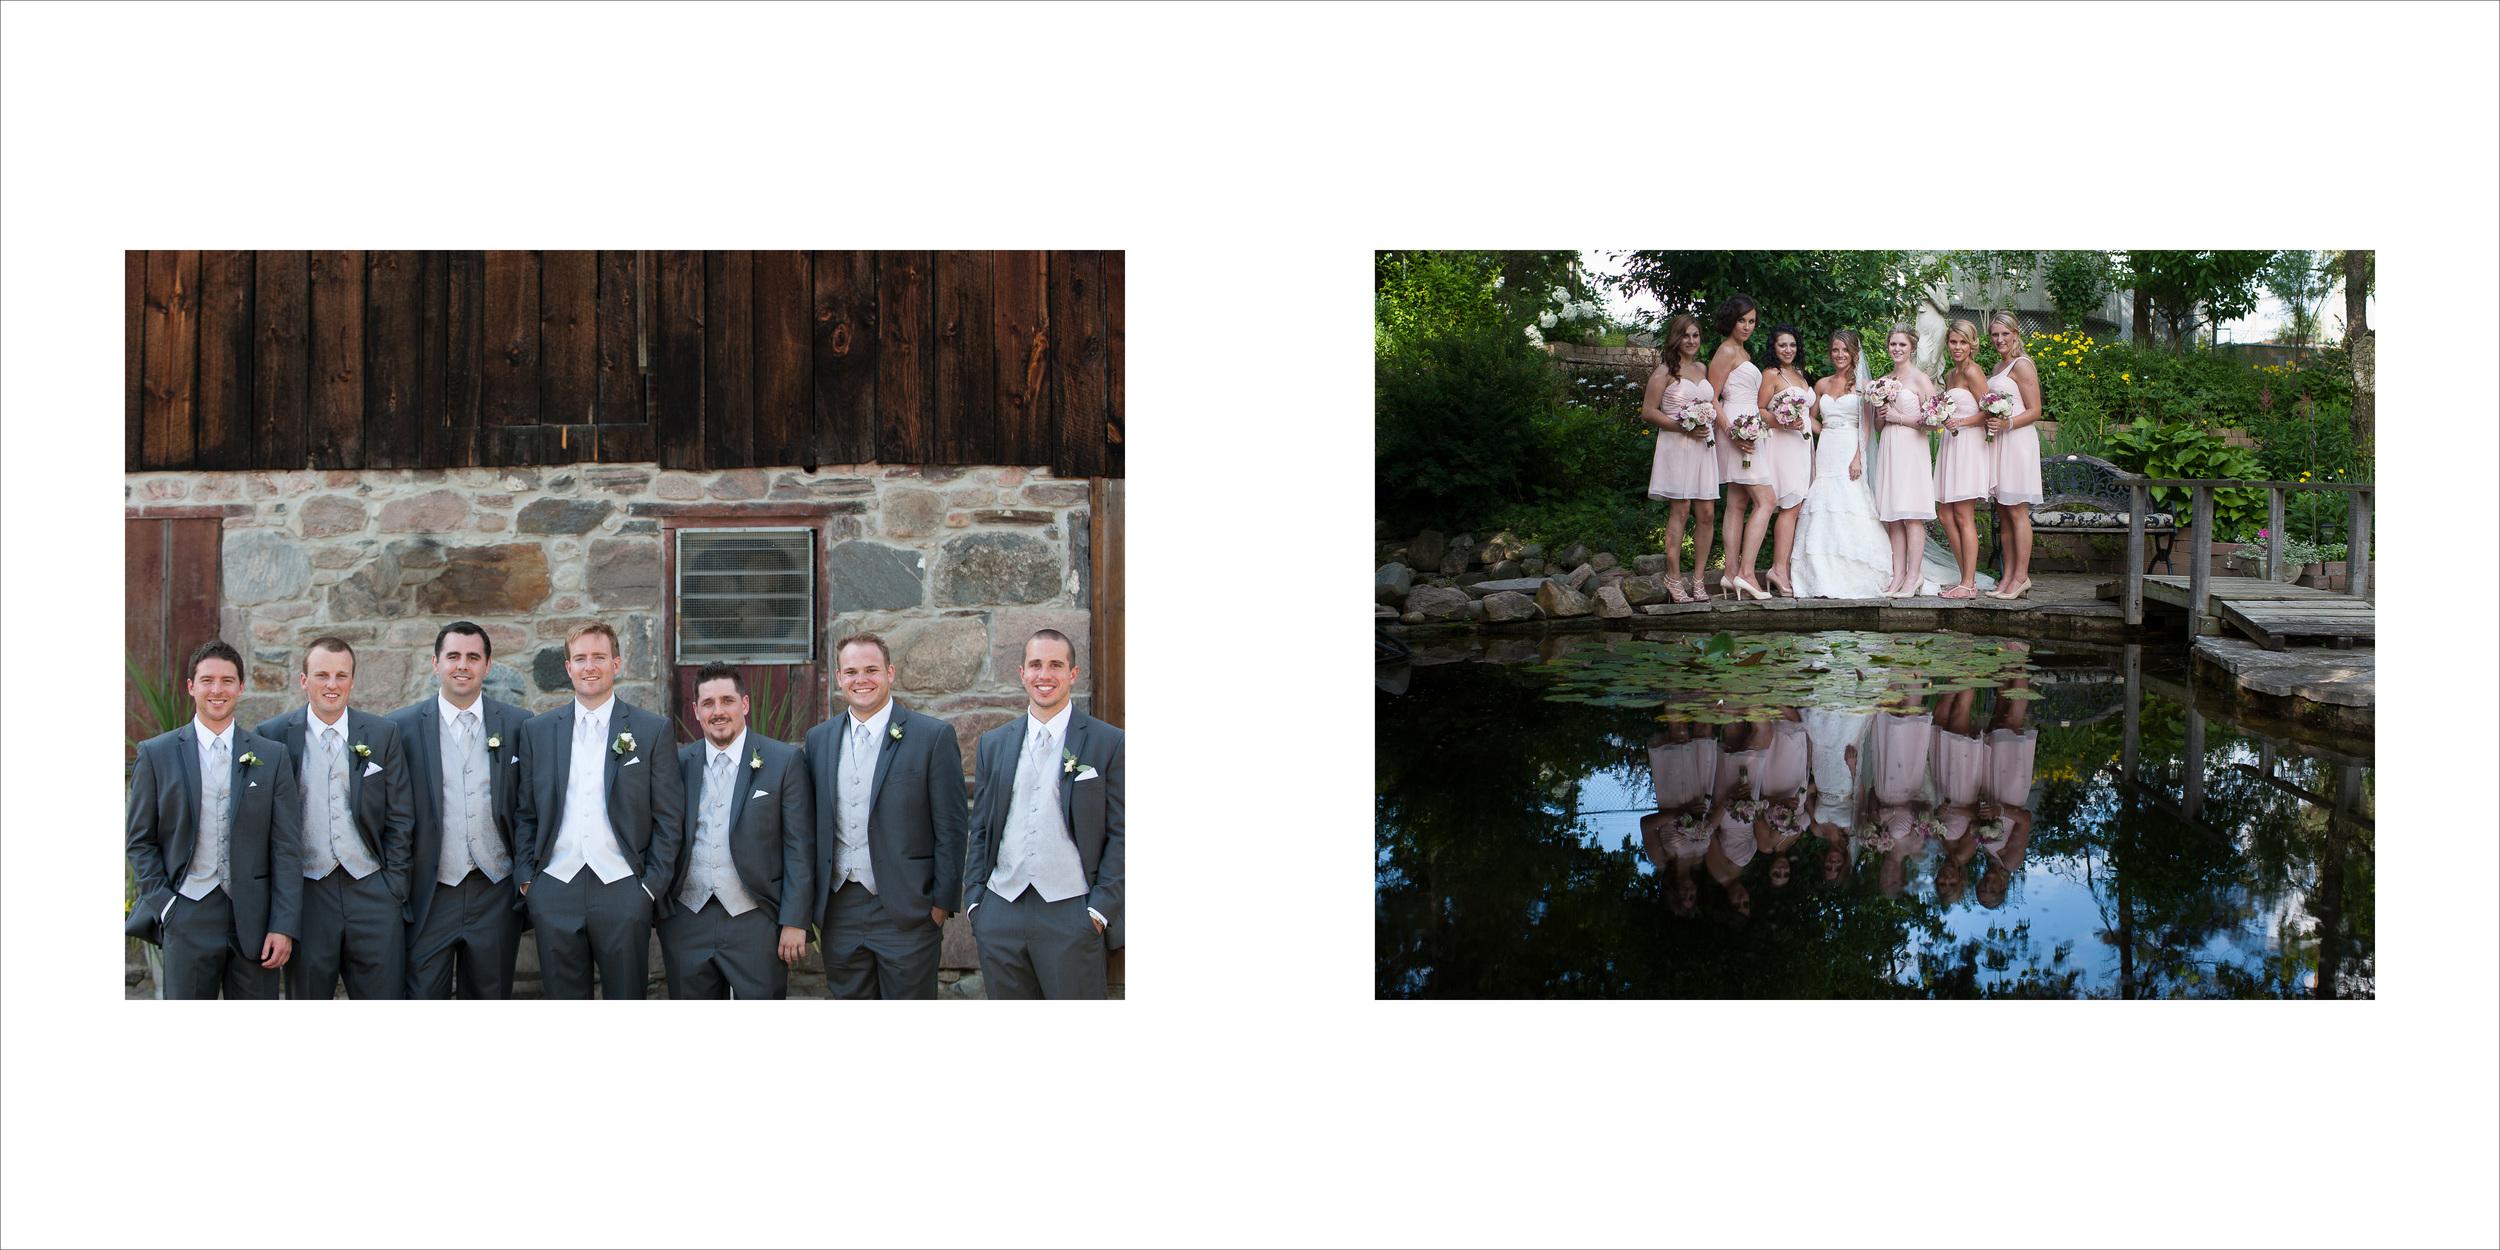 nith-ridge-wedding-album15.jpg